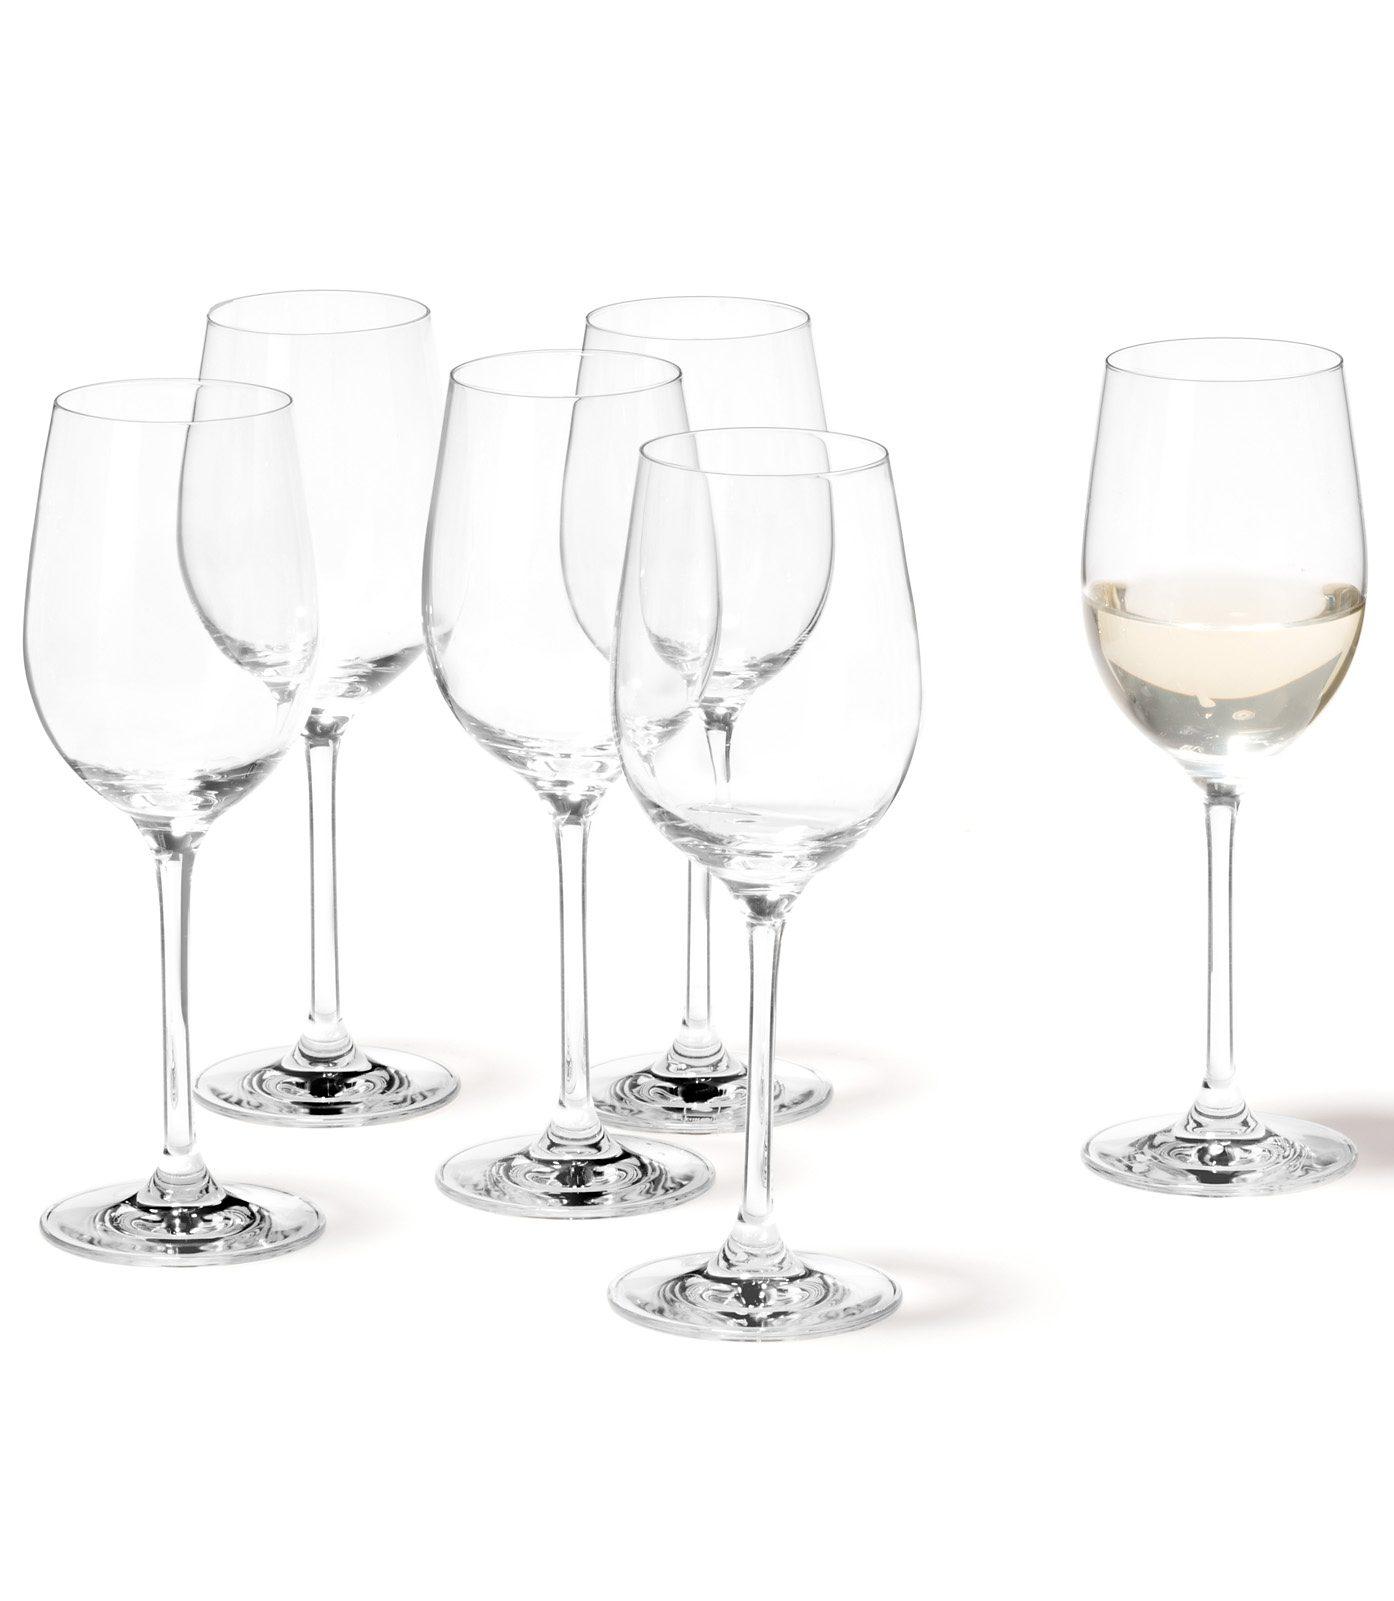 Set: Weißweingläser, Leonardo, »Ciao+« (6 Stck.)